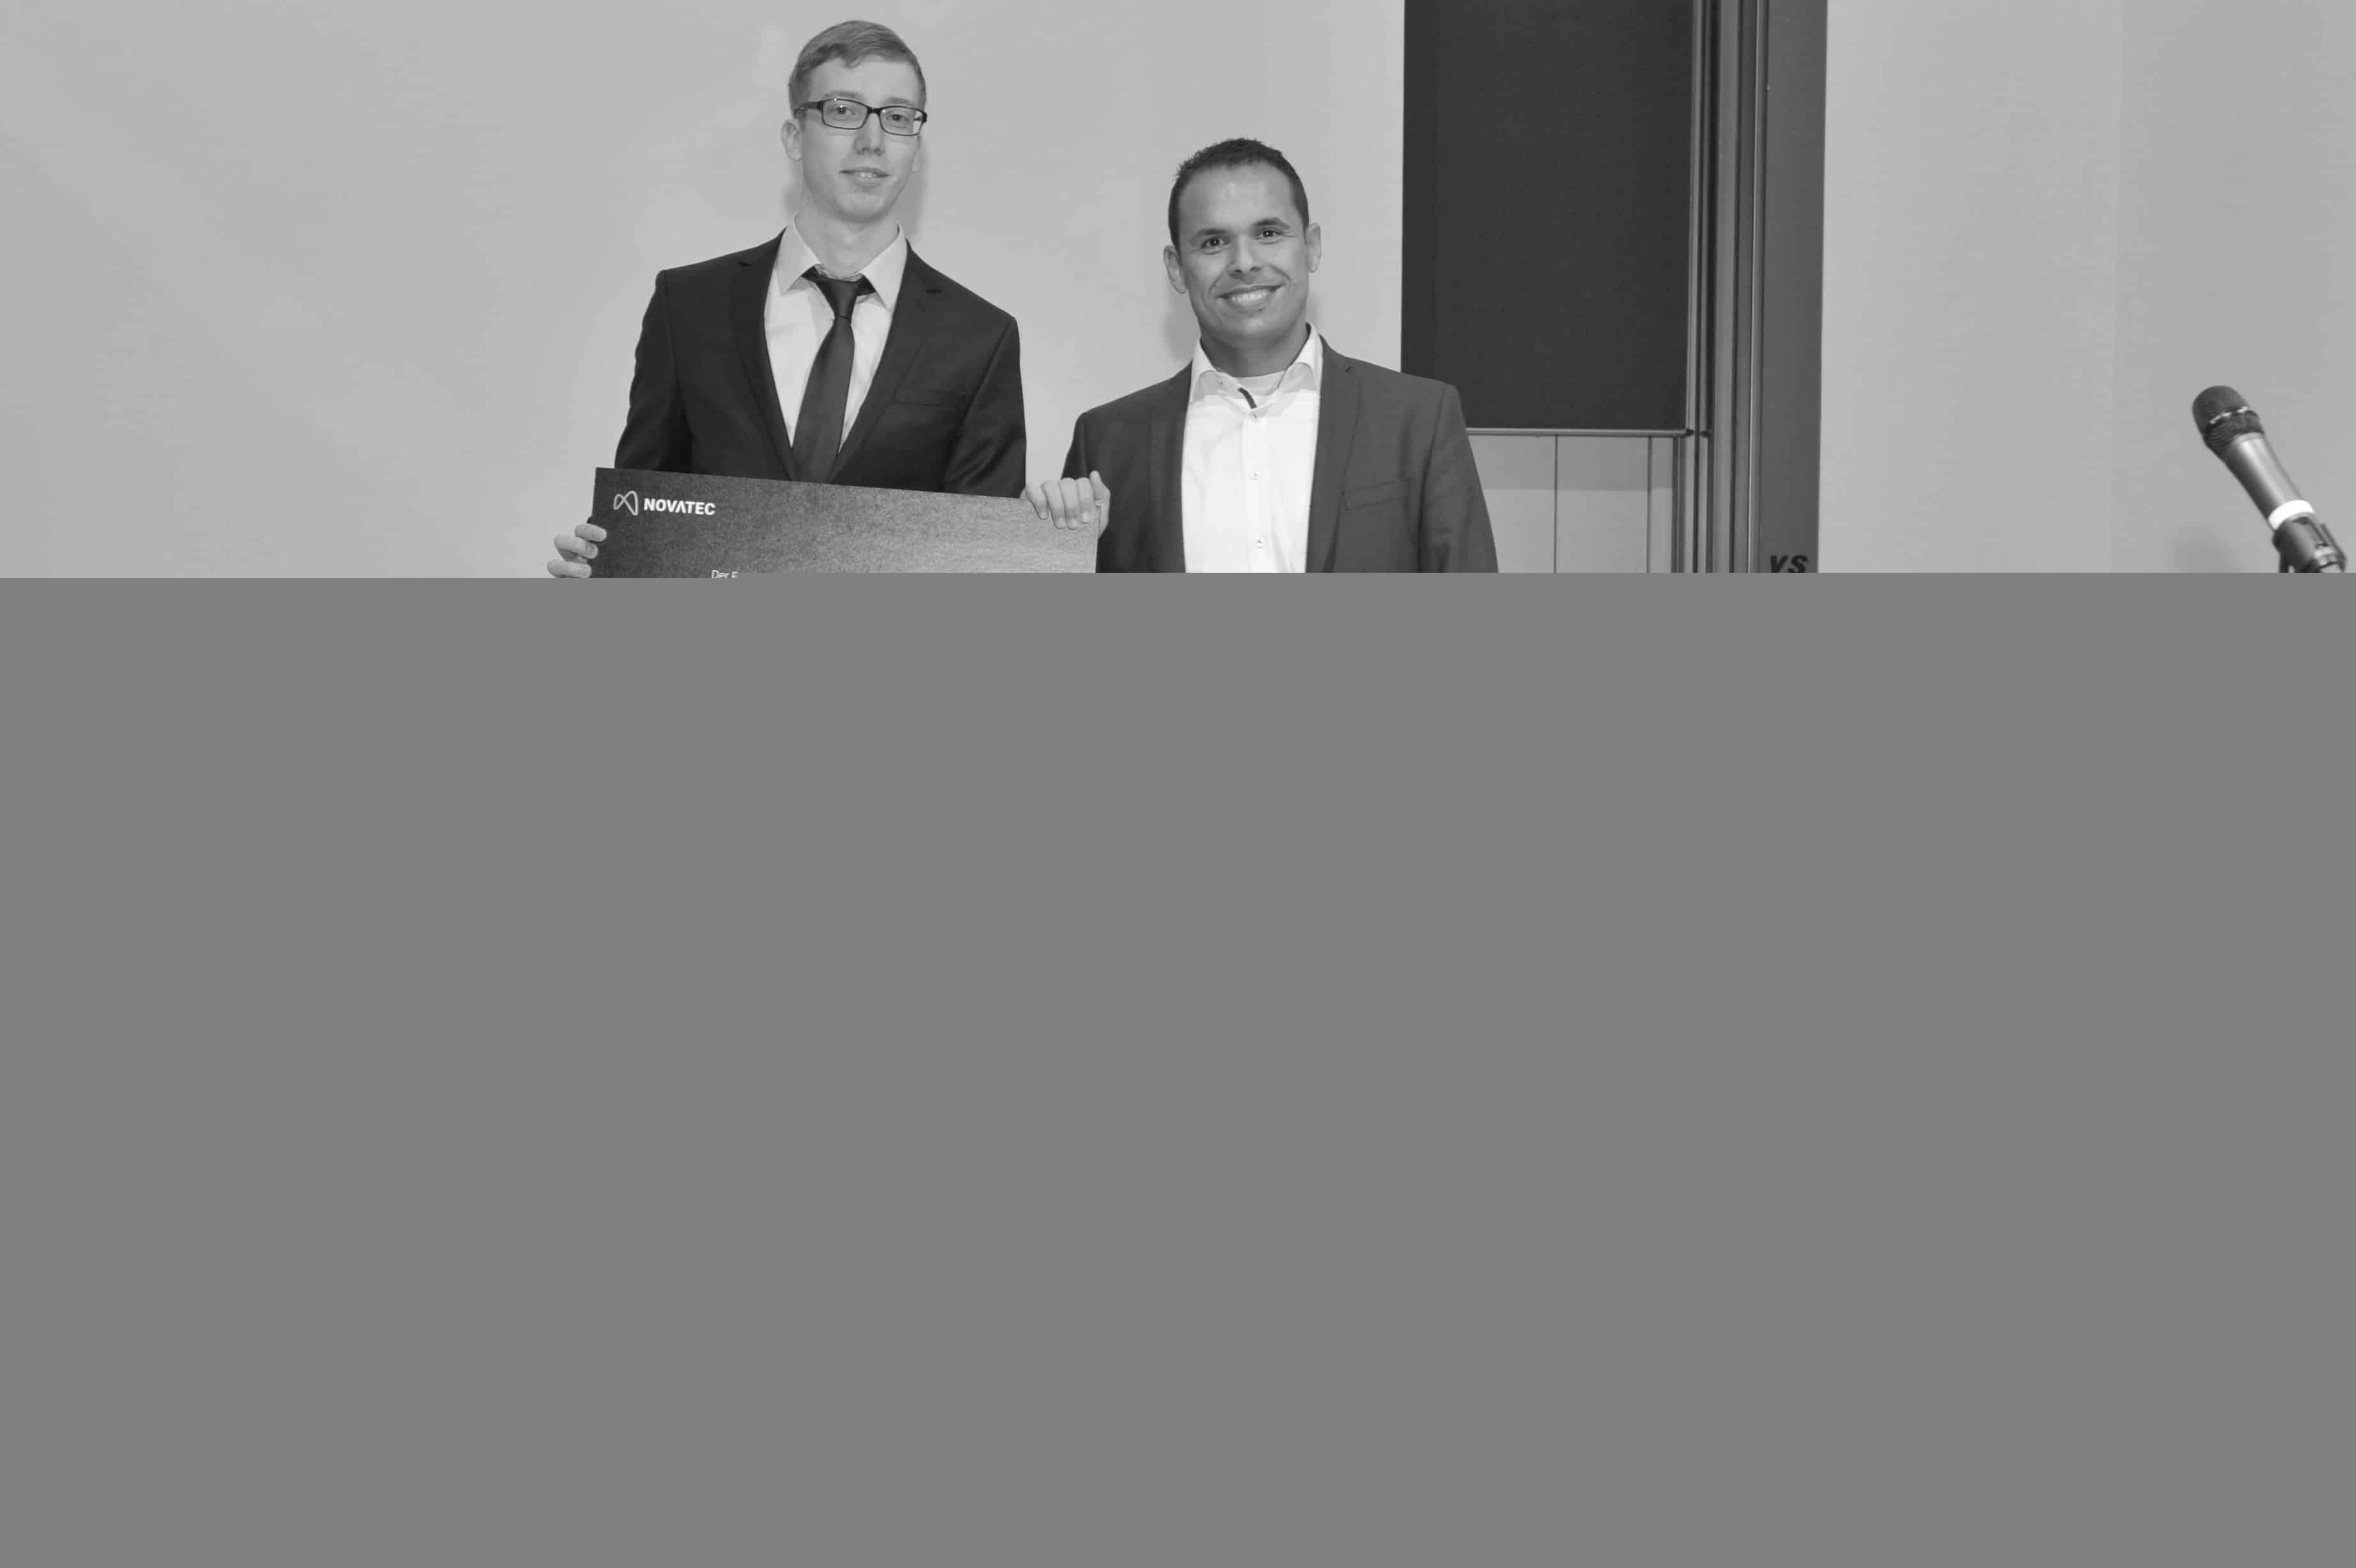 20181109_Preisverleihung_HochschuleKaiserslautern_DSC_2045_SW